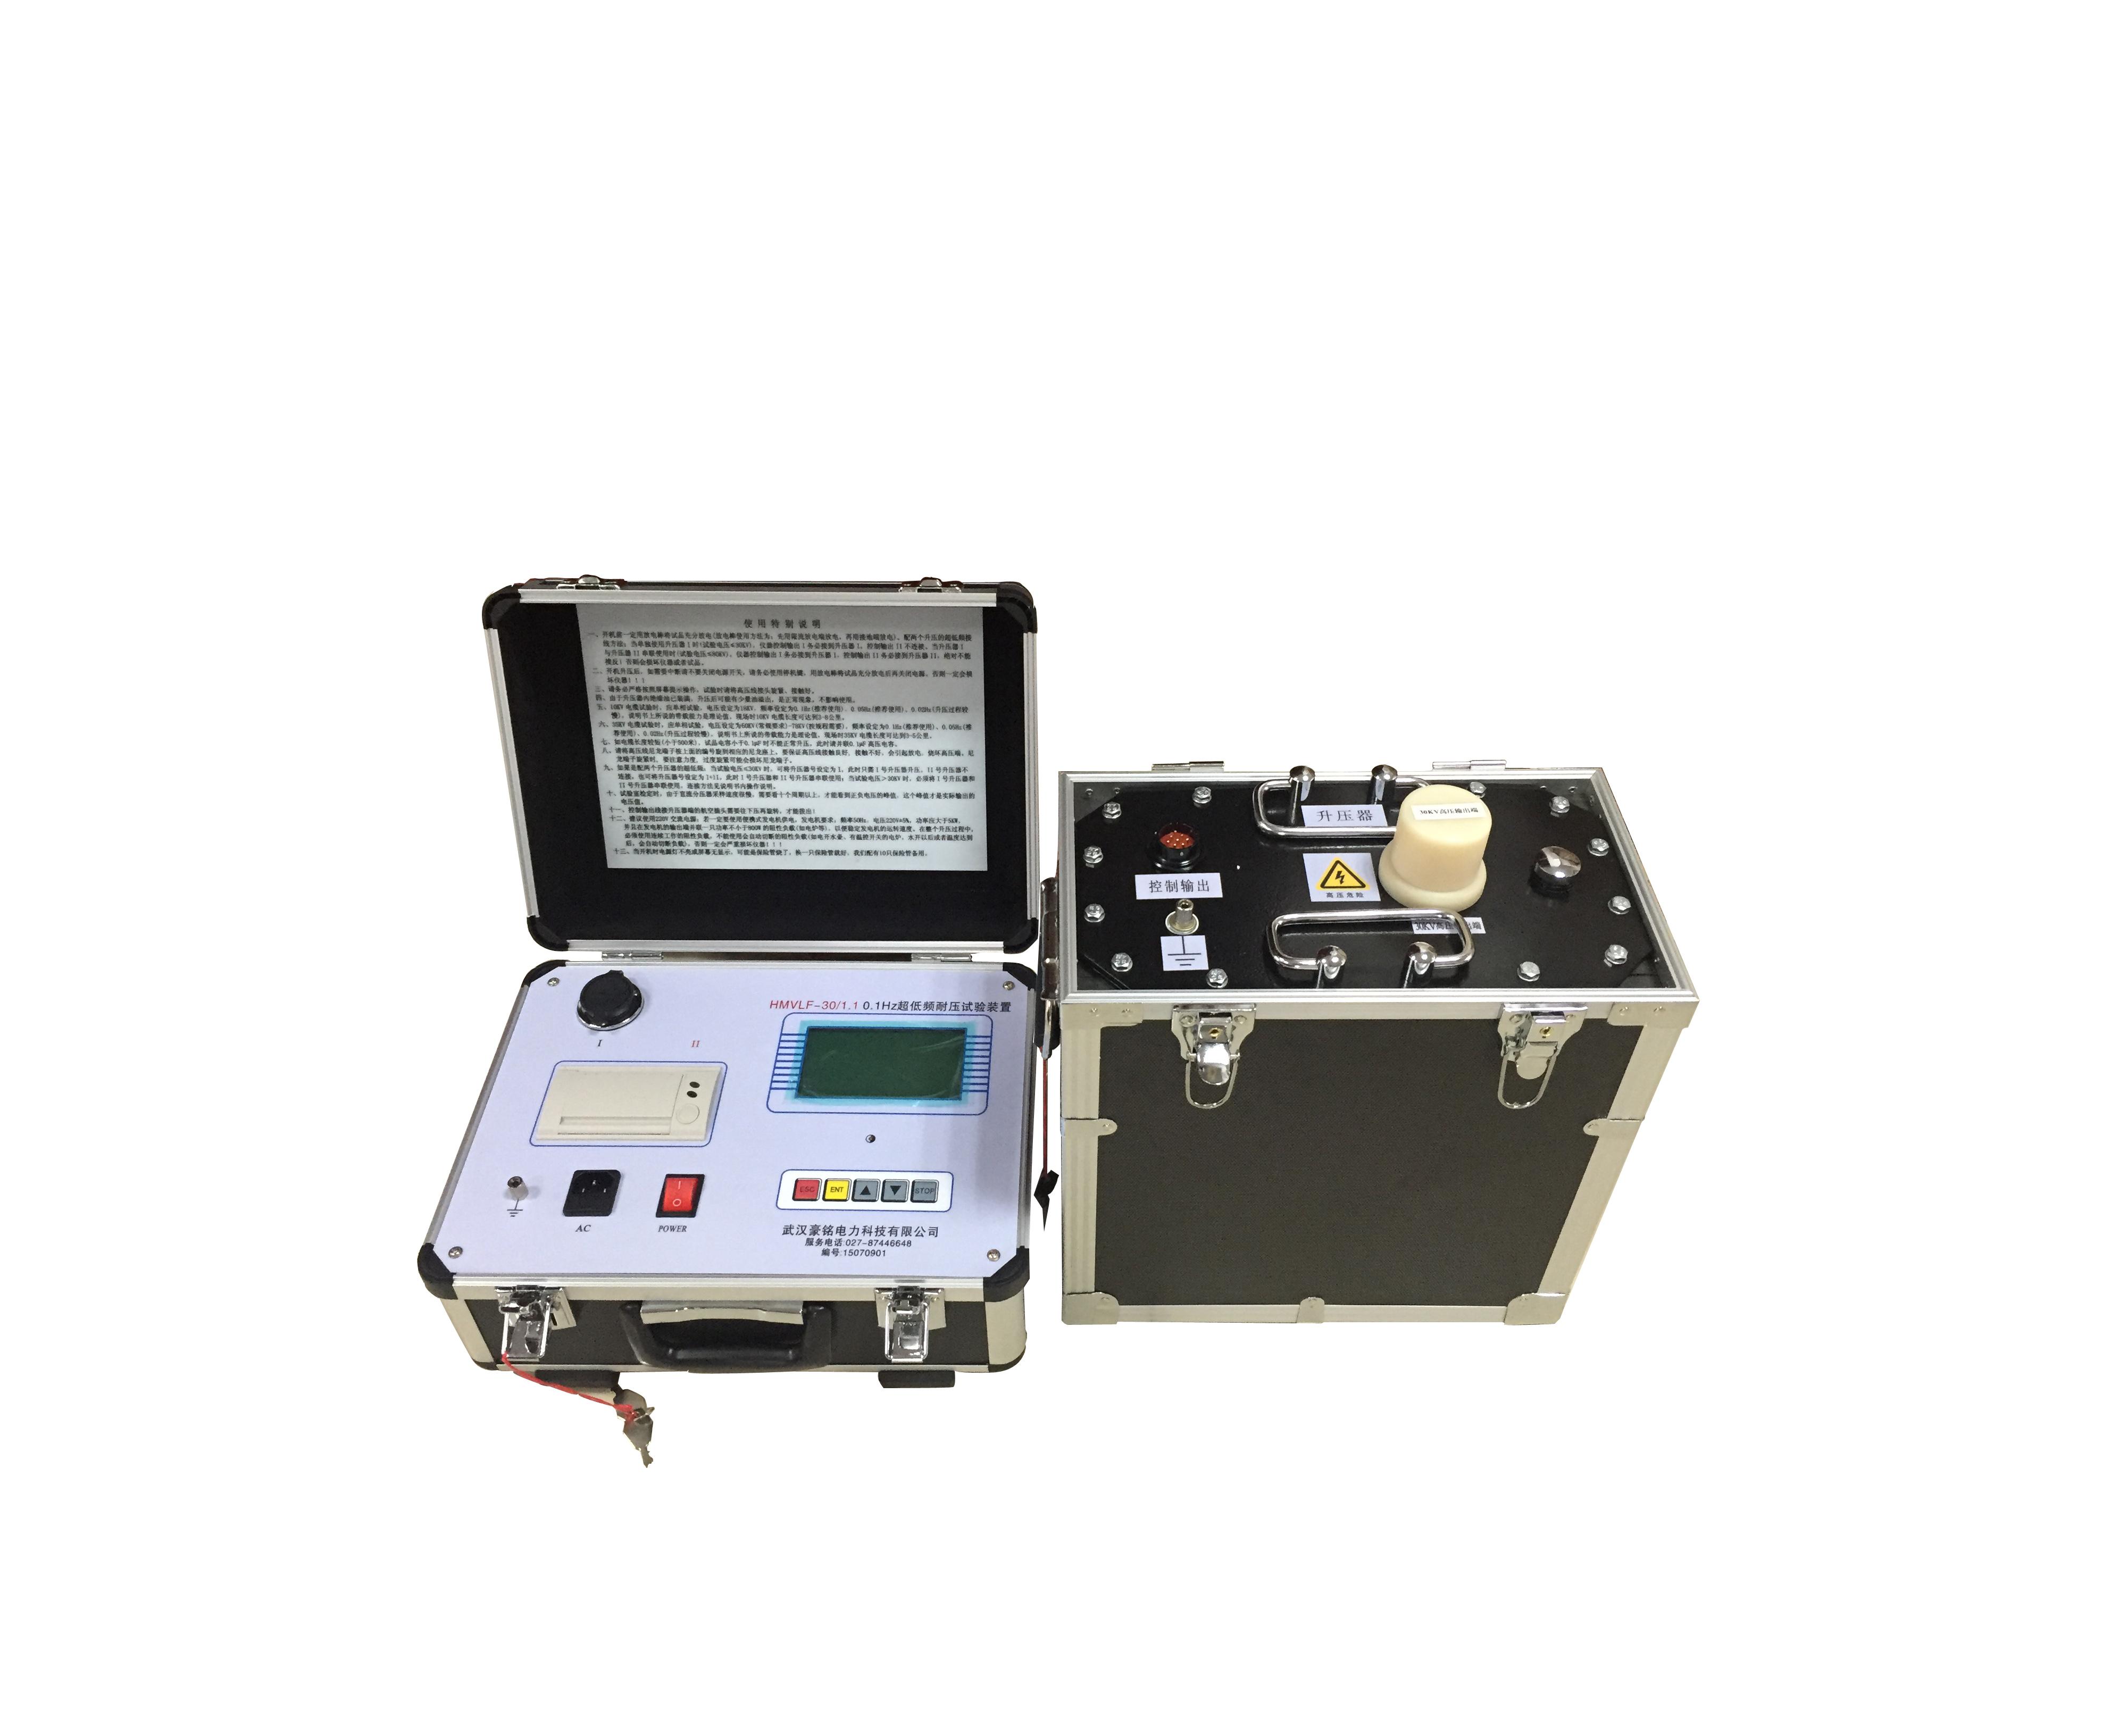 HMVLF-30/1.1  0.1HZ超低頻耐壓試驗裝置